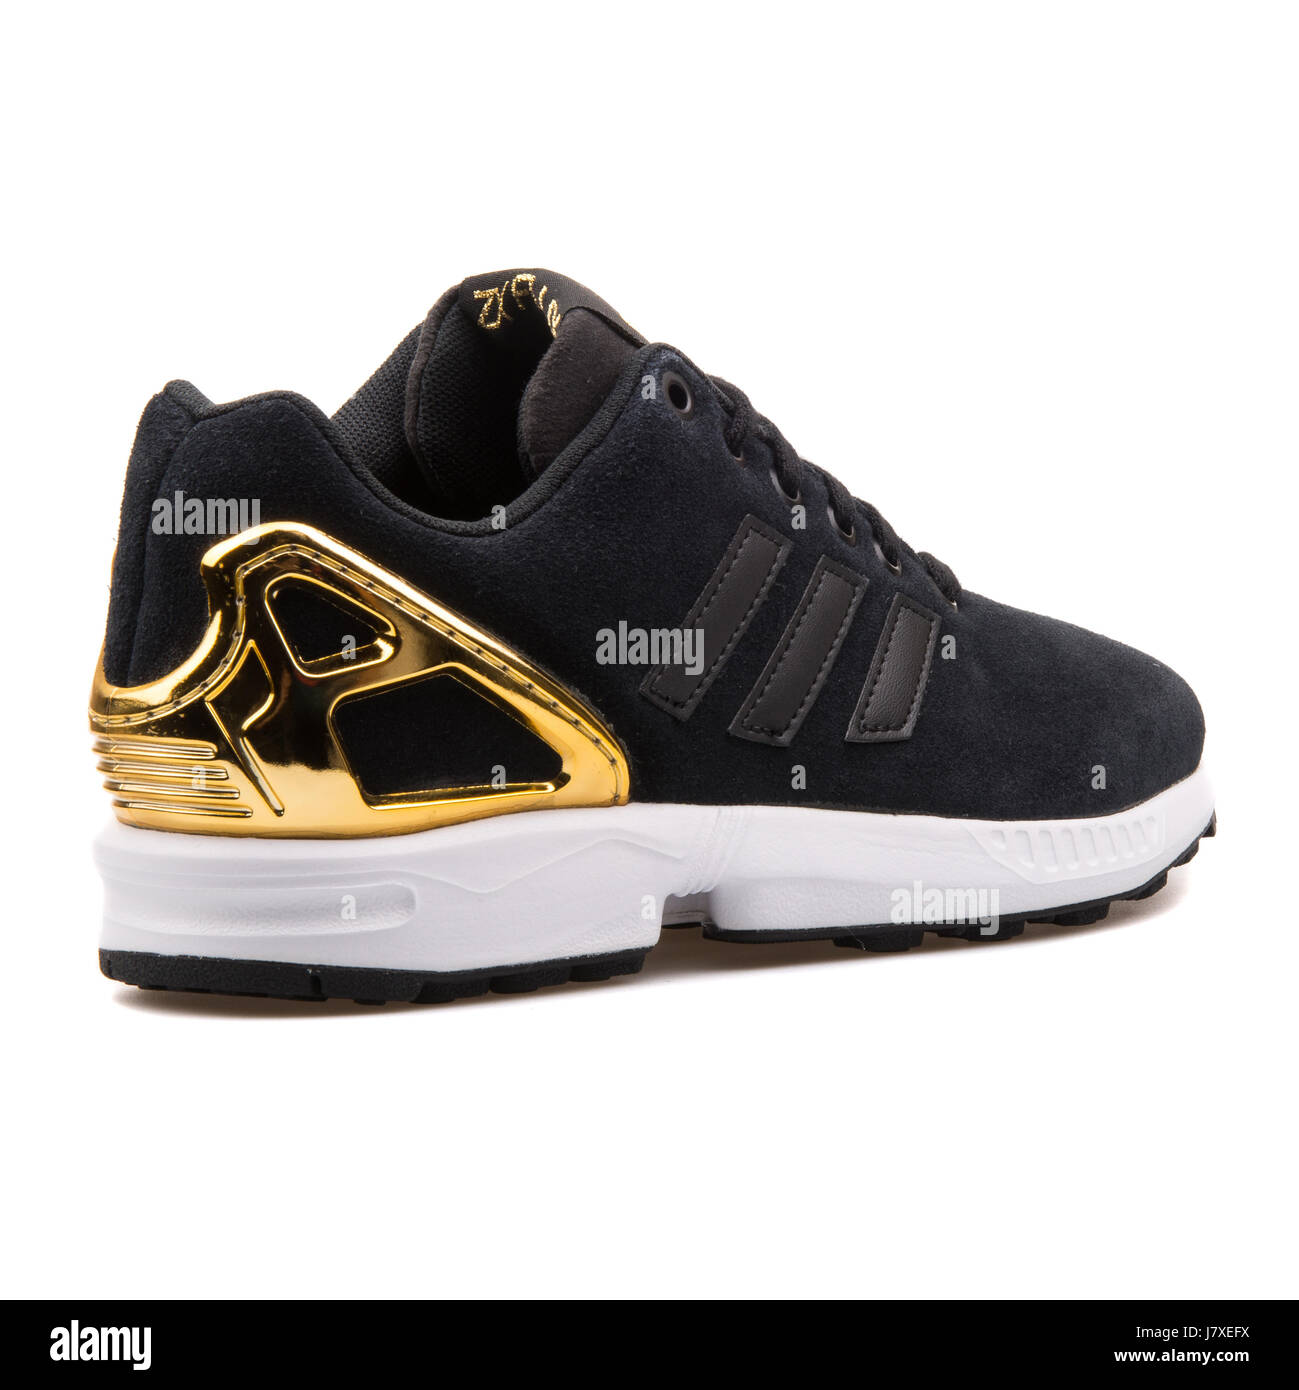 adidas zx nere oro